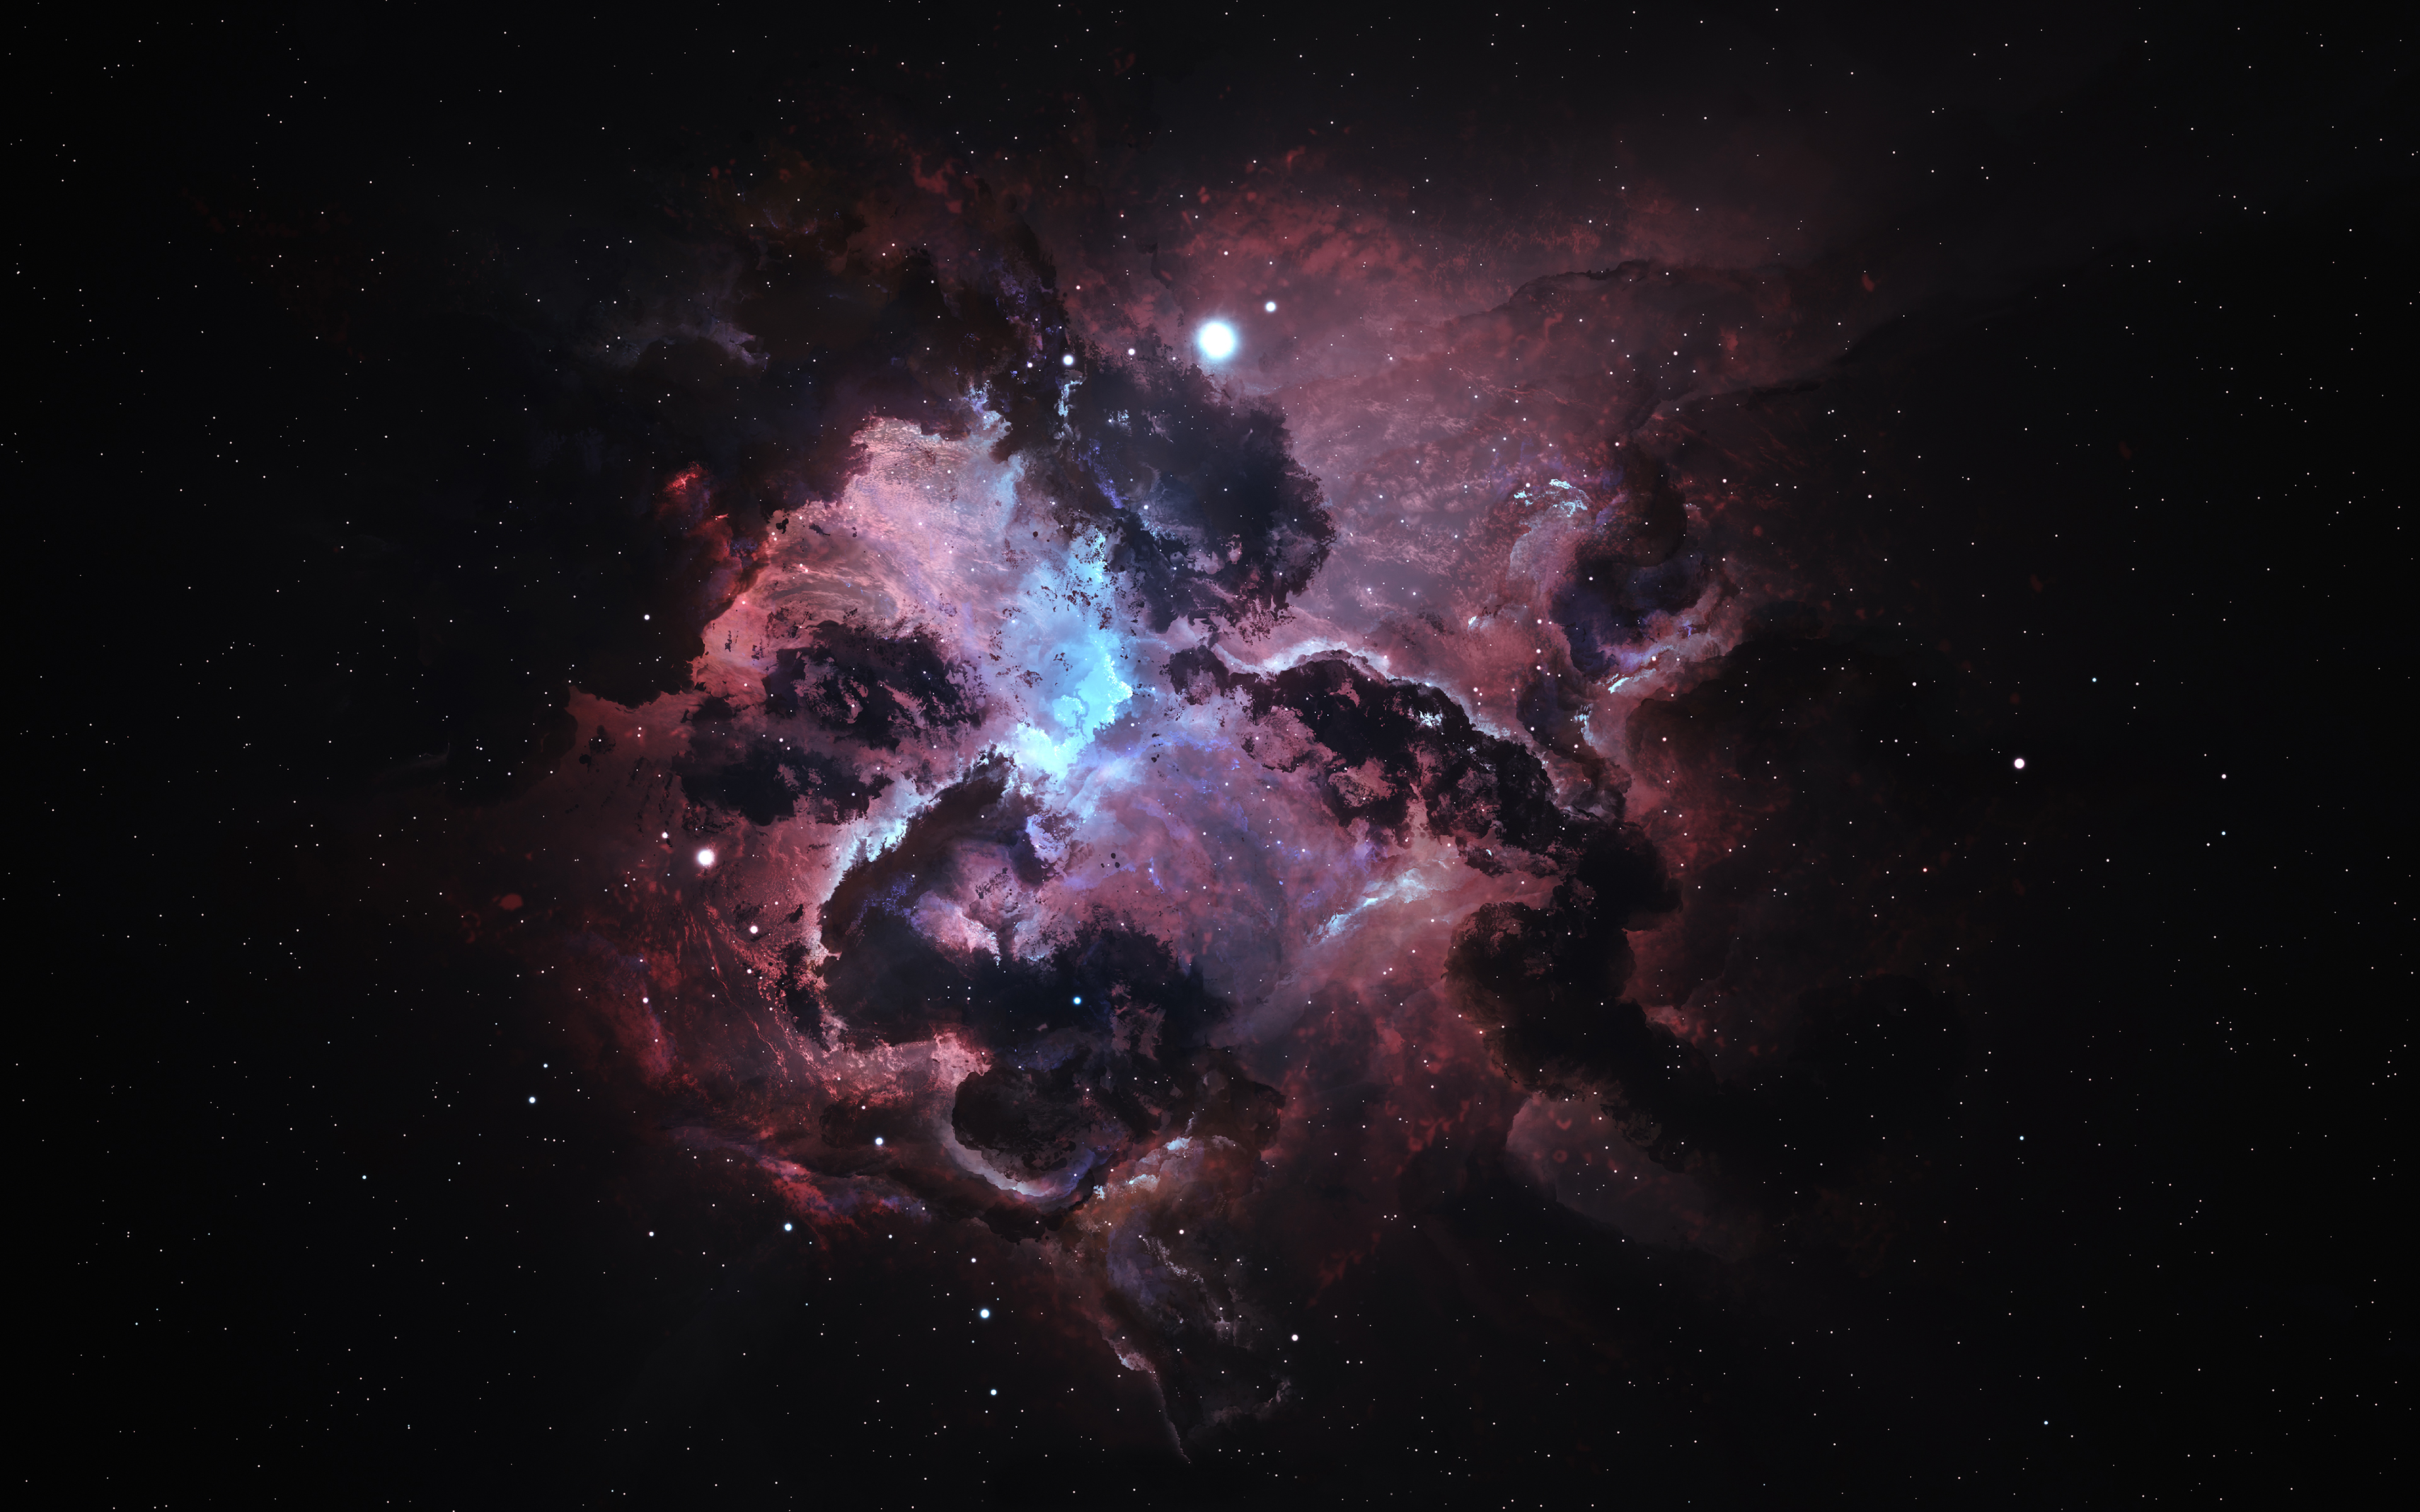 download nebula for windows 107818 6432 bits - HD1920×1200